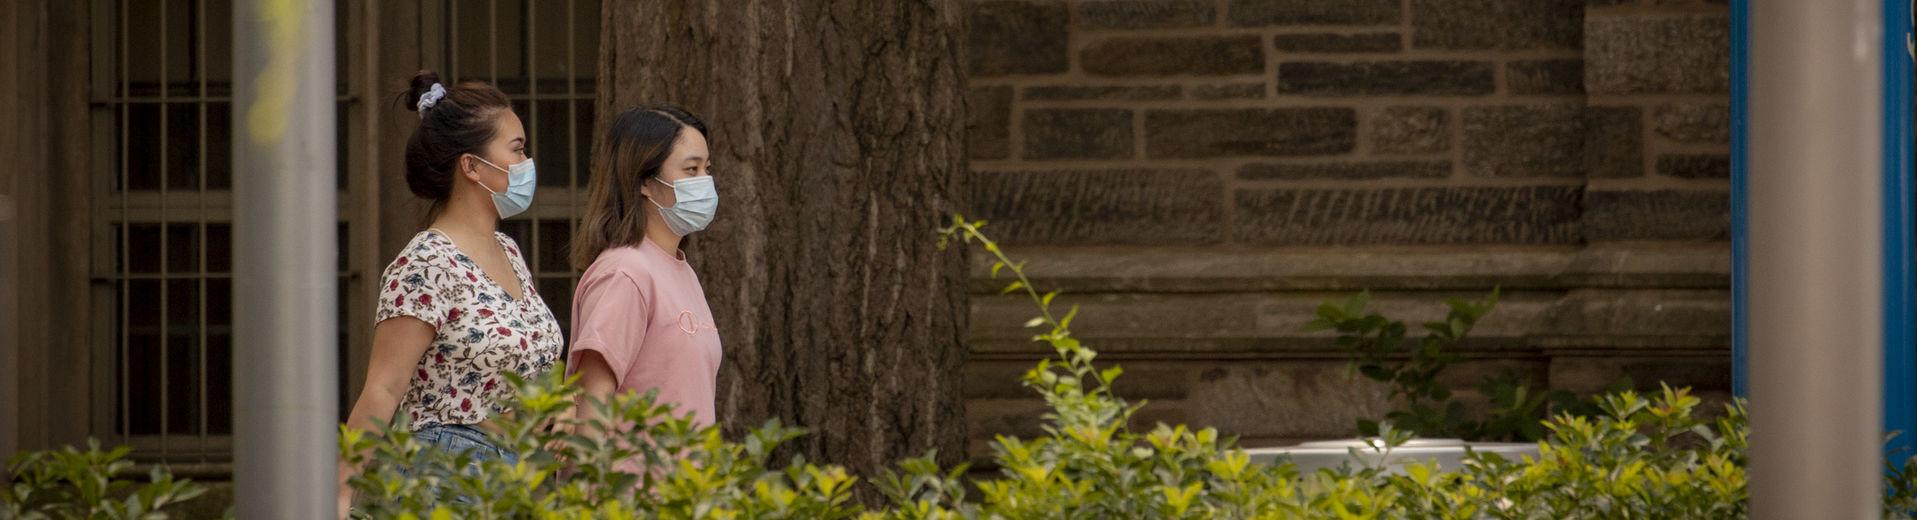 Two Temple staff members wearing masks walk across campus